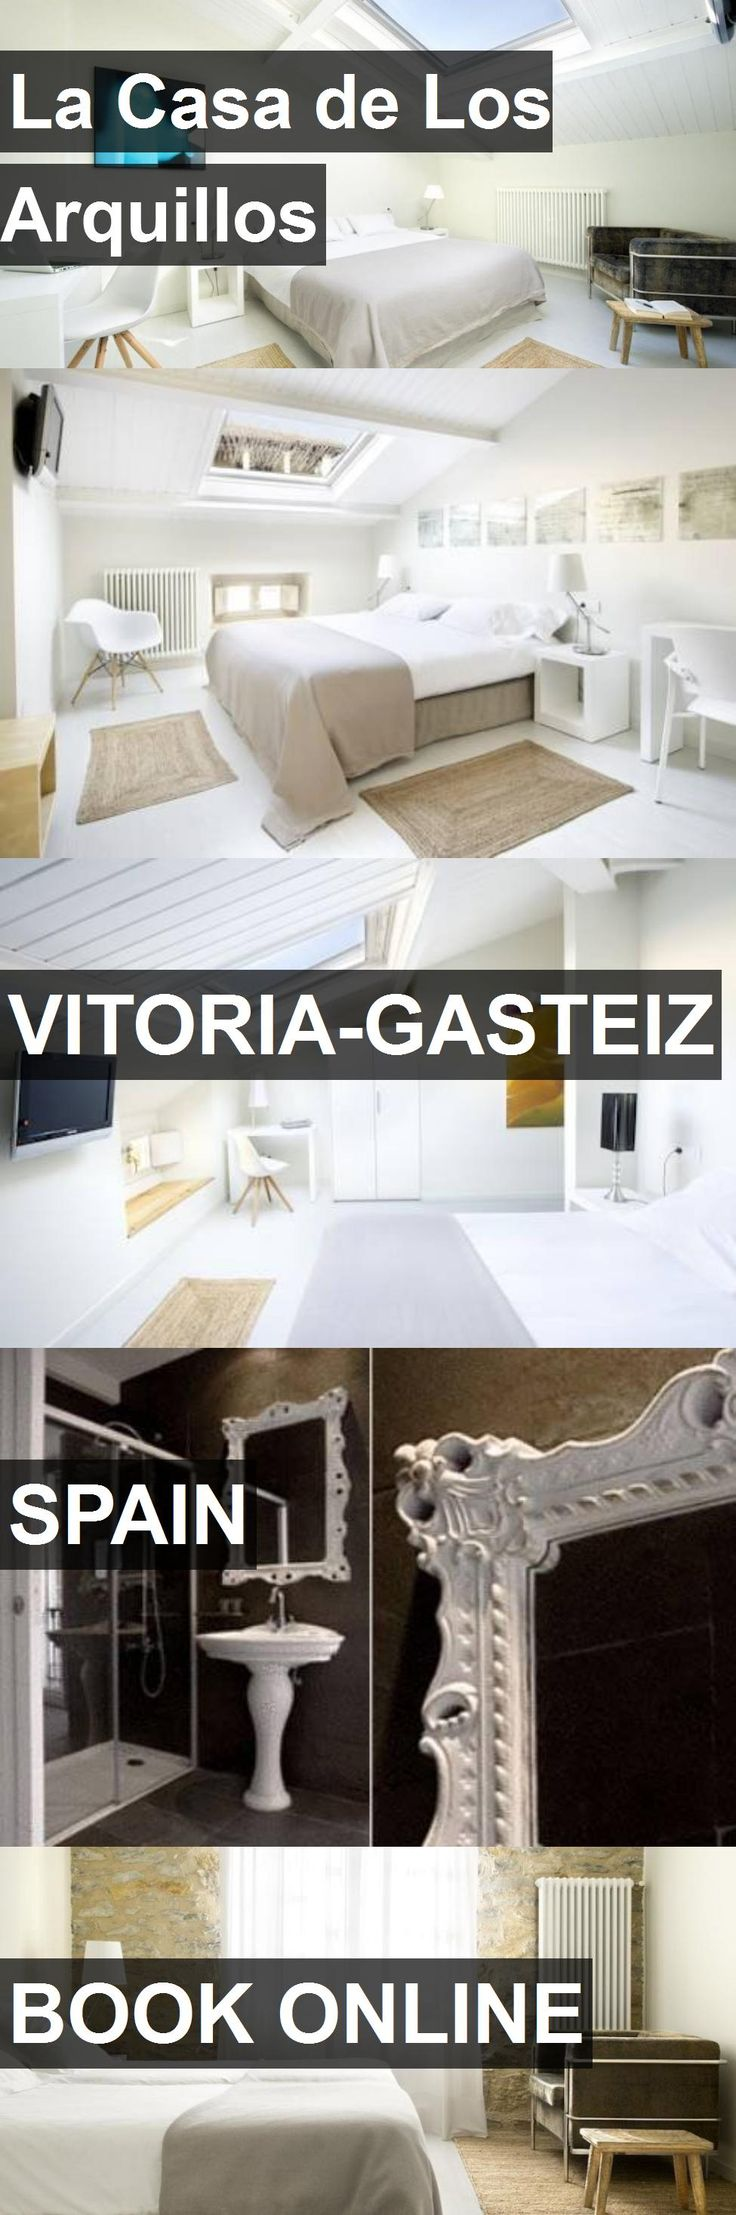 Hotel La Casa de Los Arquillos in Vitoria-Gasteiz, Spain. For more information, photos, reviews and best prices please follow the link. #Spain #Vitoria-Gasteiz #travel #vacation #hotel